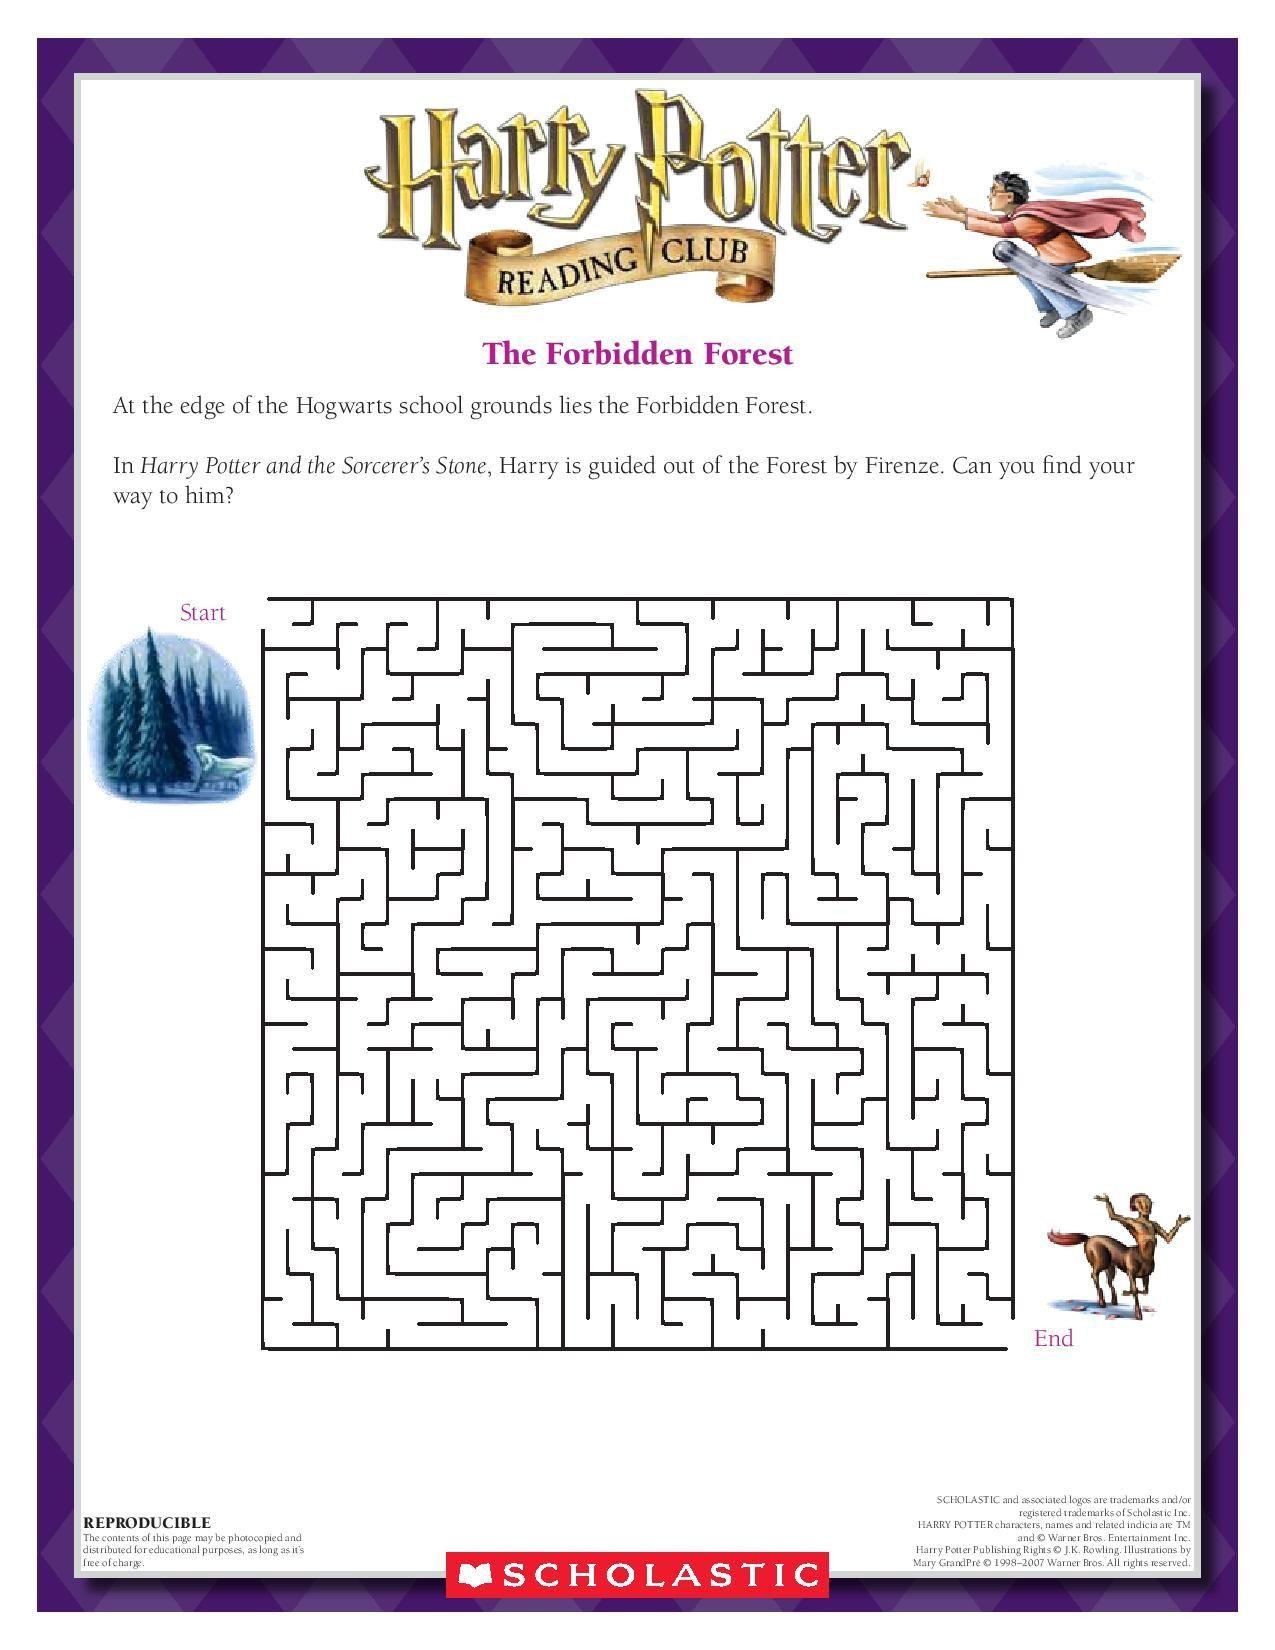 5 Worksheets Magical Maze Harry Potter Activities Harry Potter Games Harry Potter Birthday [ 1650 x 1275 Pixel ]